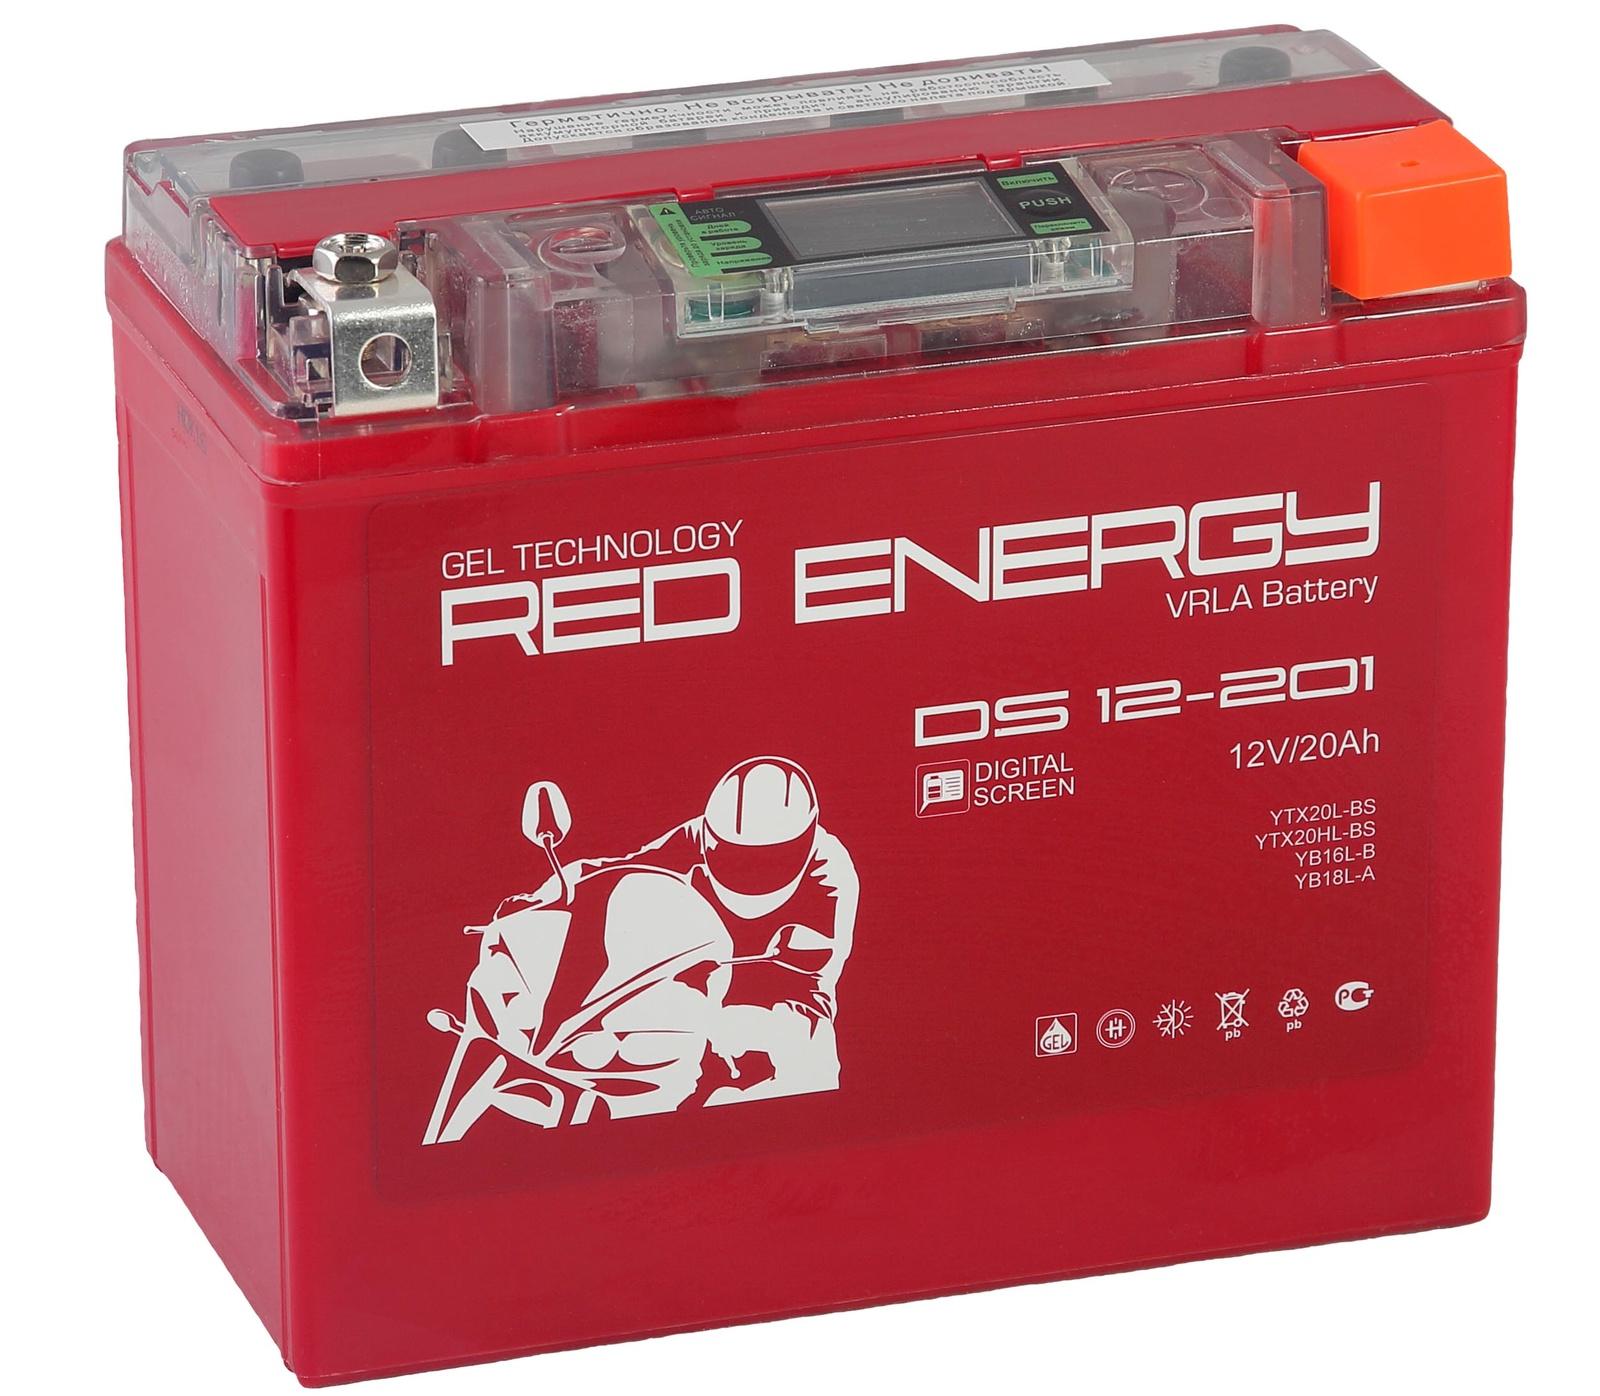 Аккумулятор для мототехники Red Energy DS 12201 все цены